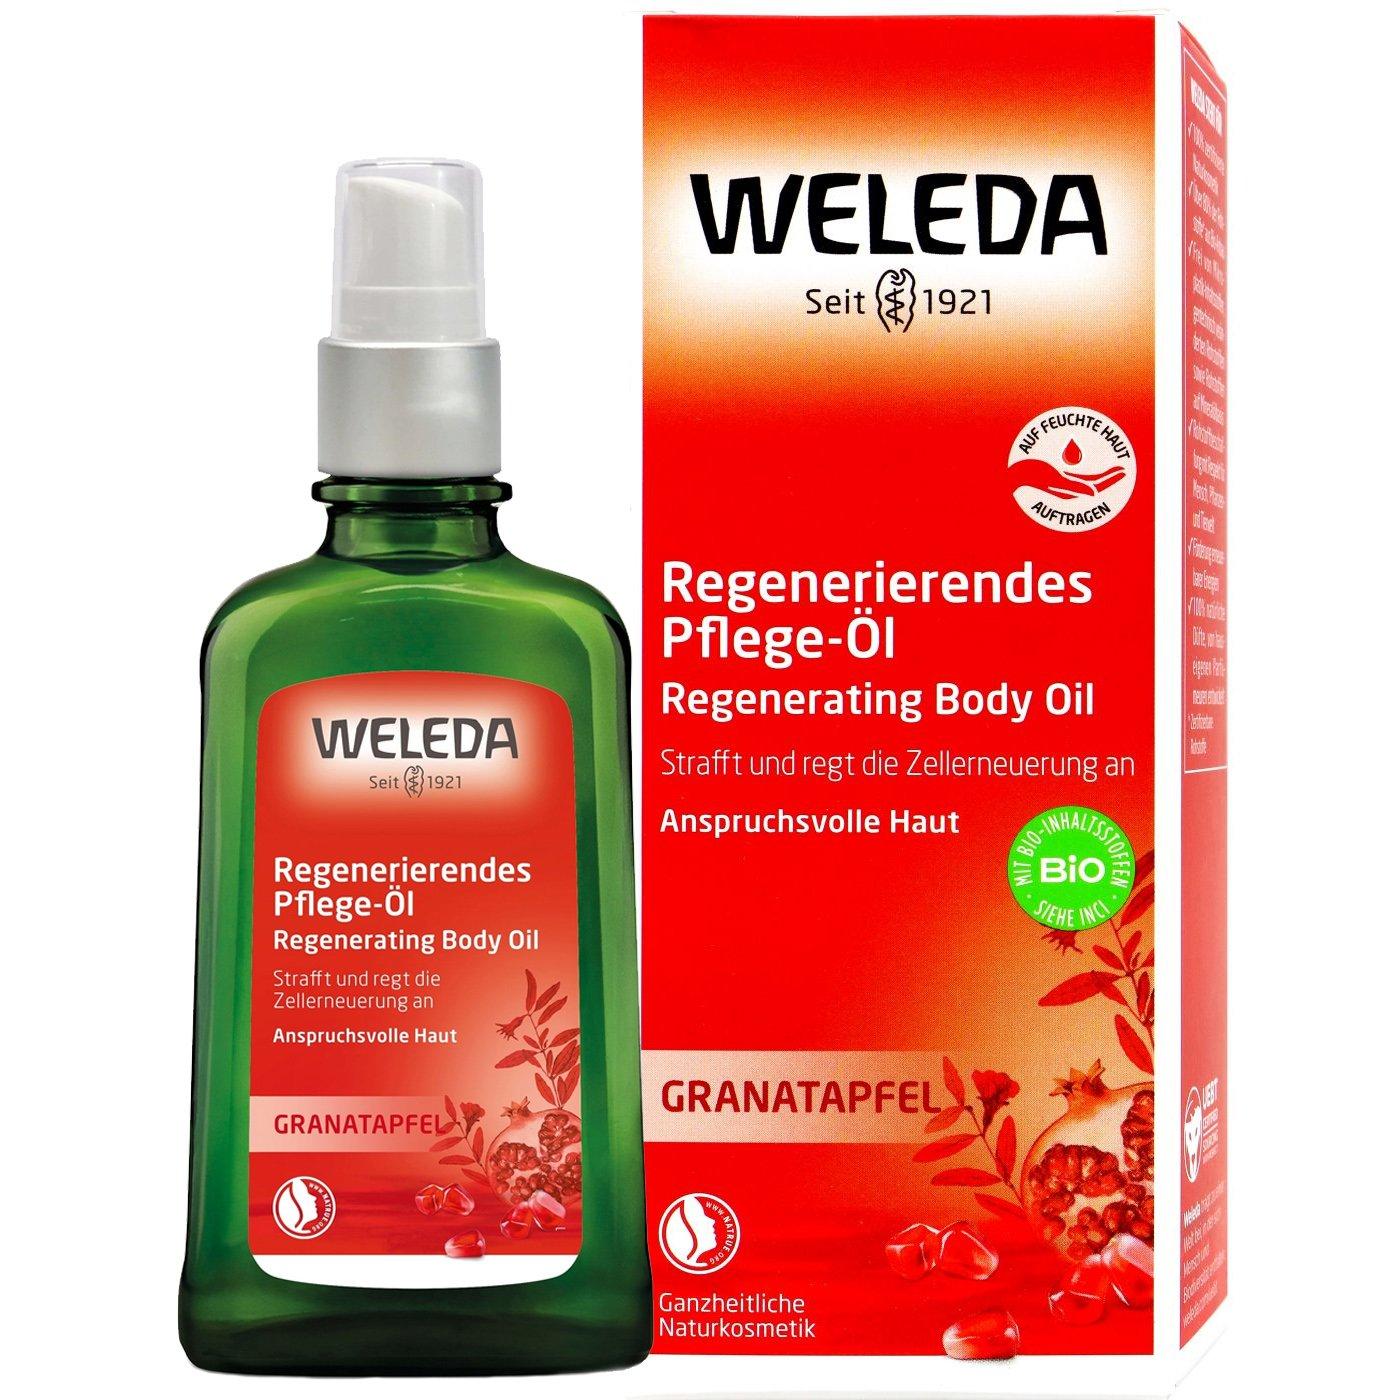 Weleda Granataprel Oil Λάδι με Ρόδι Ενισχύει Την Ανανέωση Των Κυττάρων Και Επαναφέρει Την Ισορροπία Της Υγρασίας 100ml